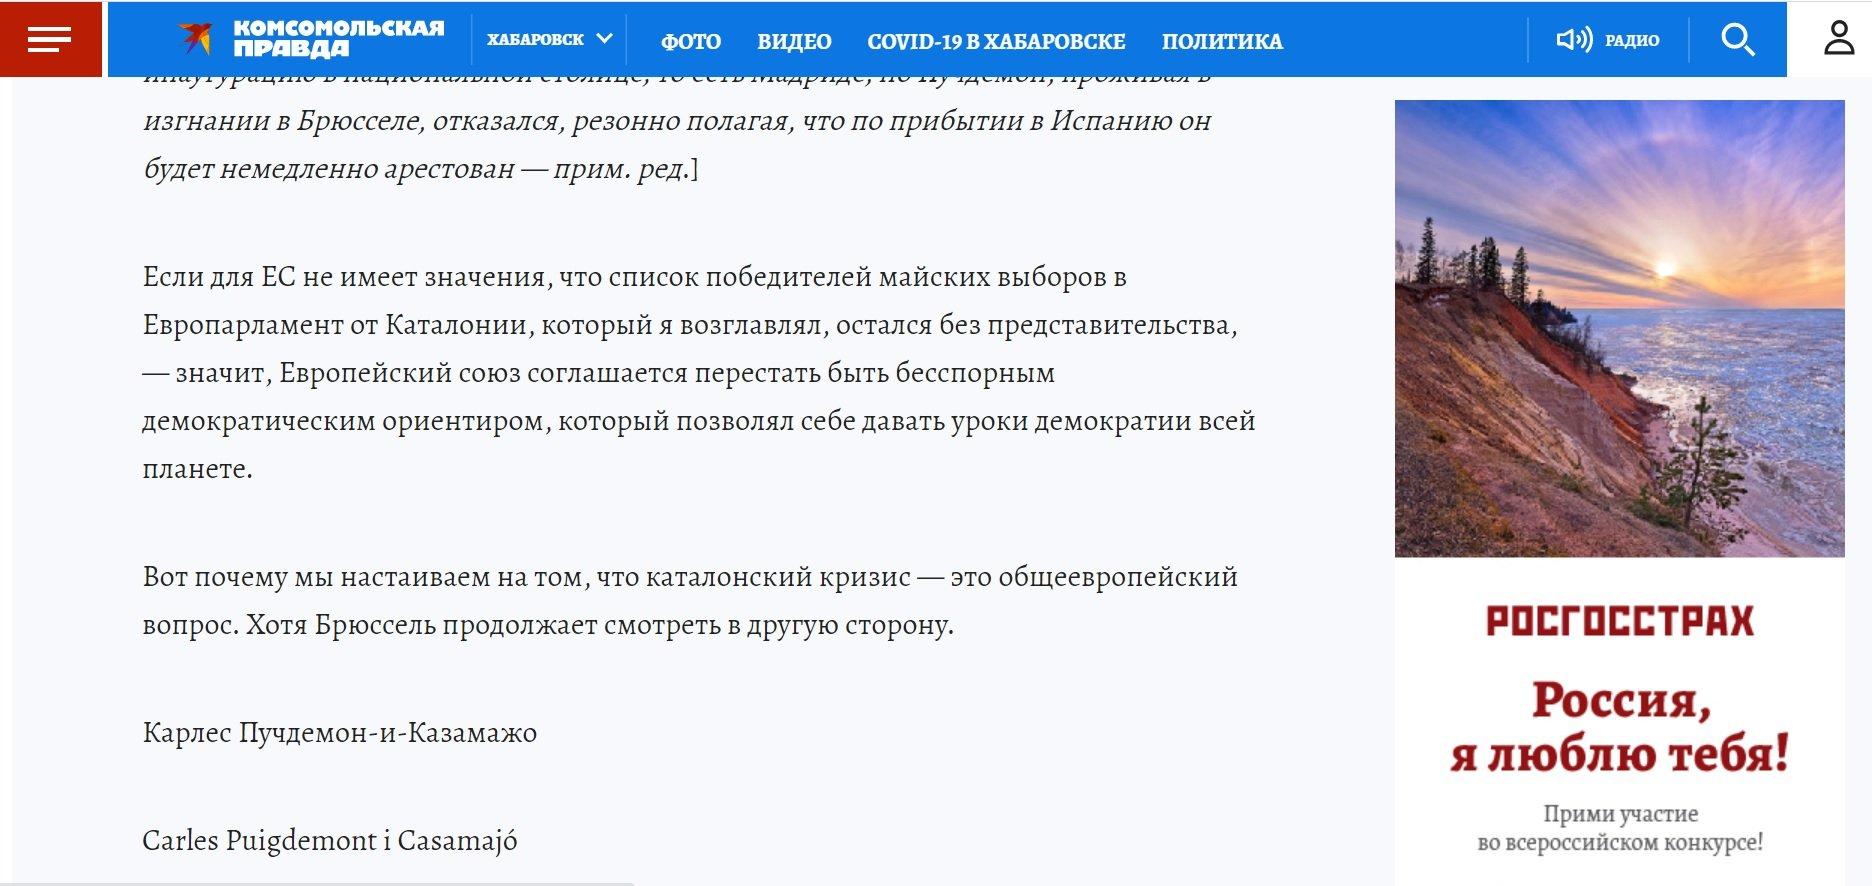 Article de Carles Puigdemont al 'Komsomolskaya Pravda'